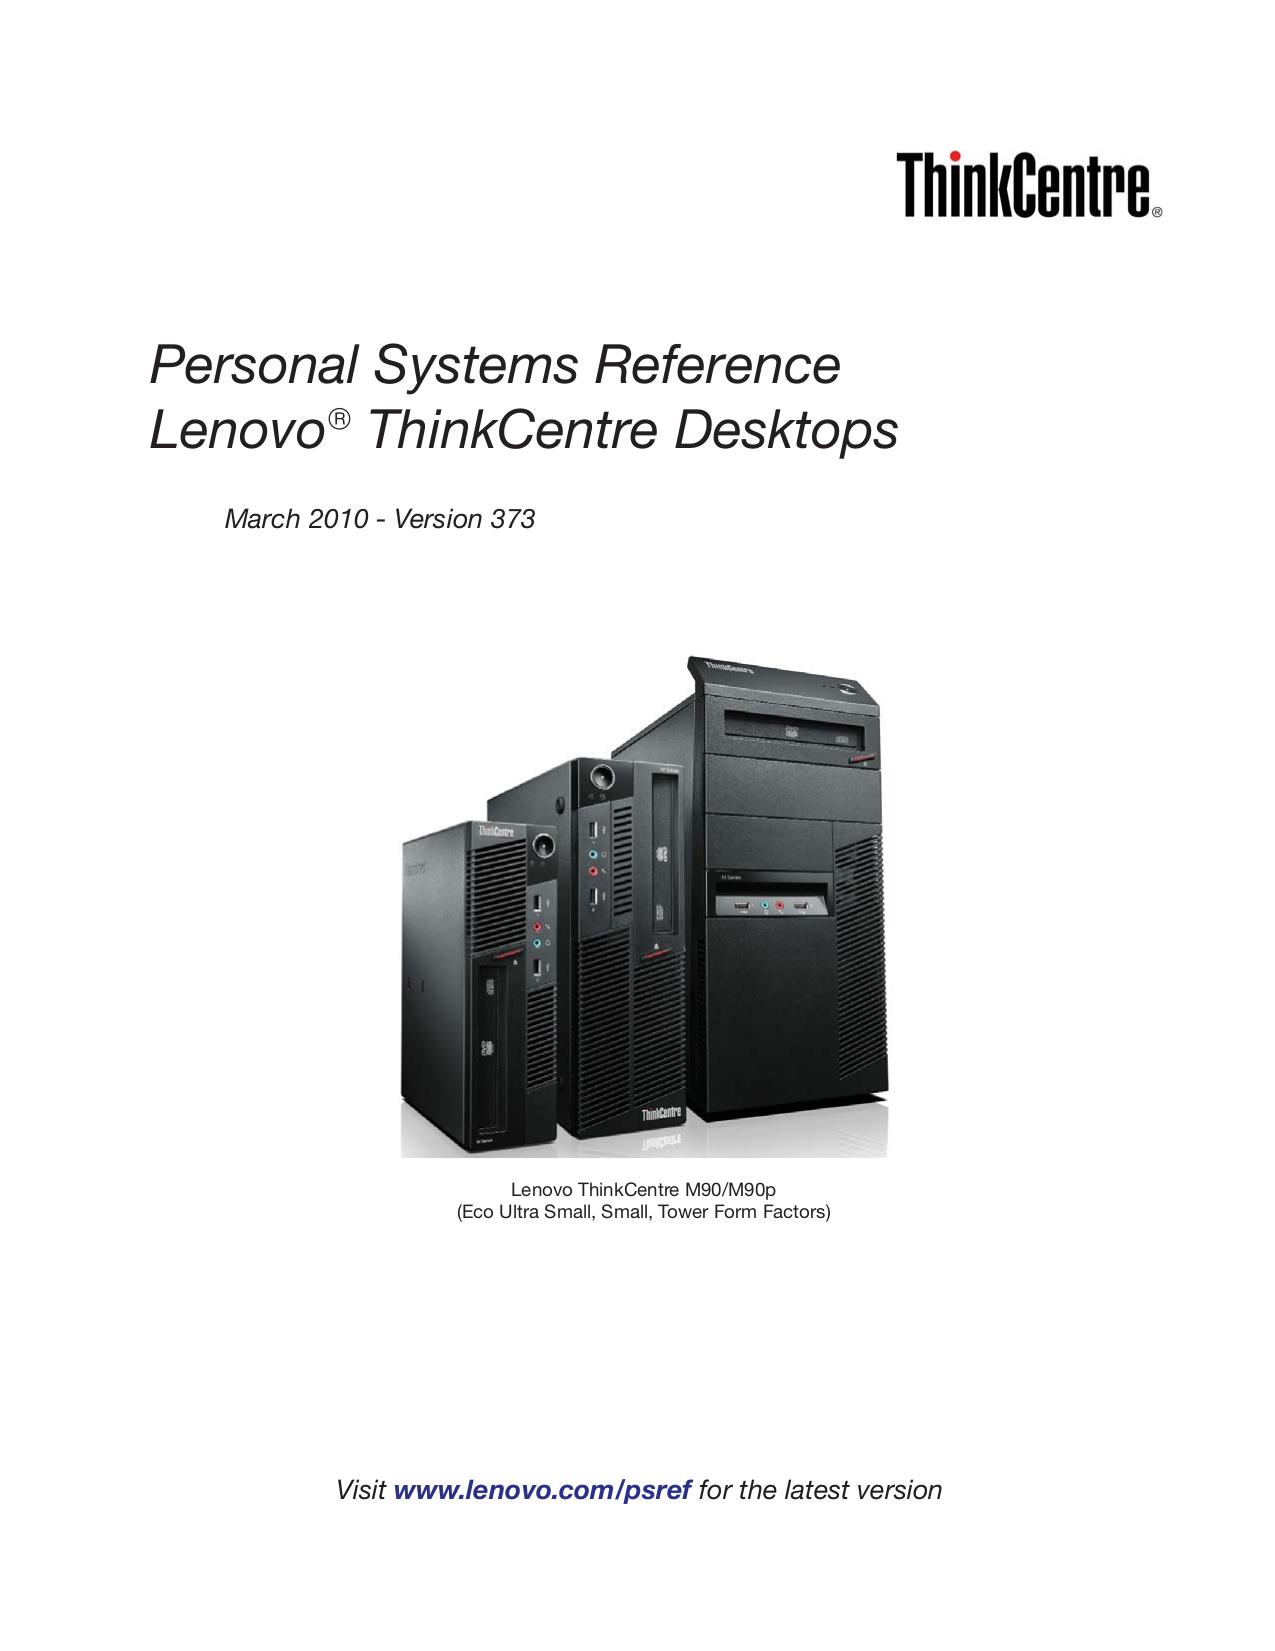 pdf for Lenovo Desktop ThinkCentre M58e 7279 manual